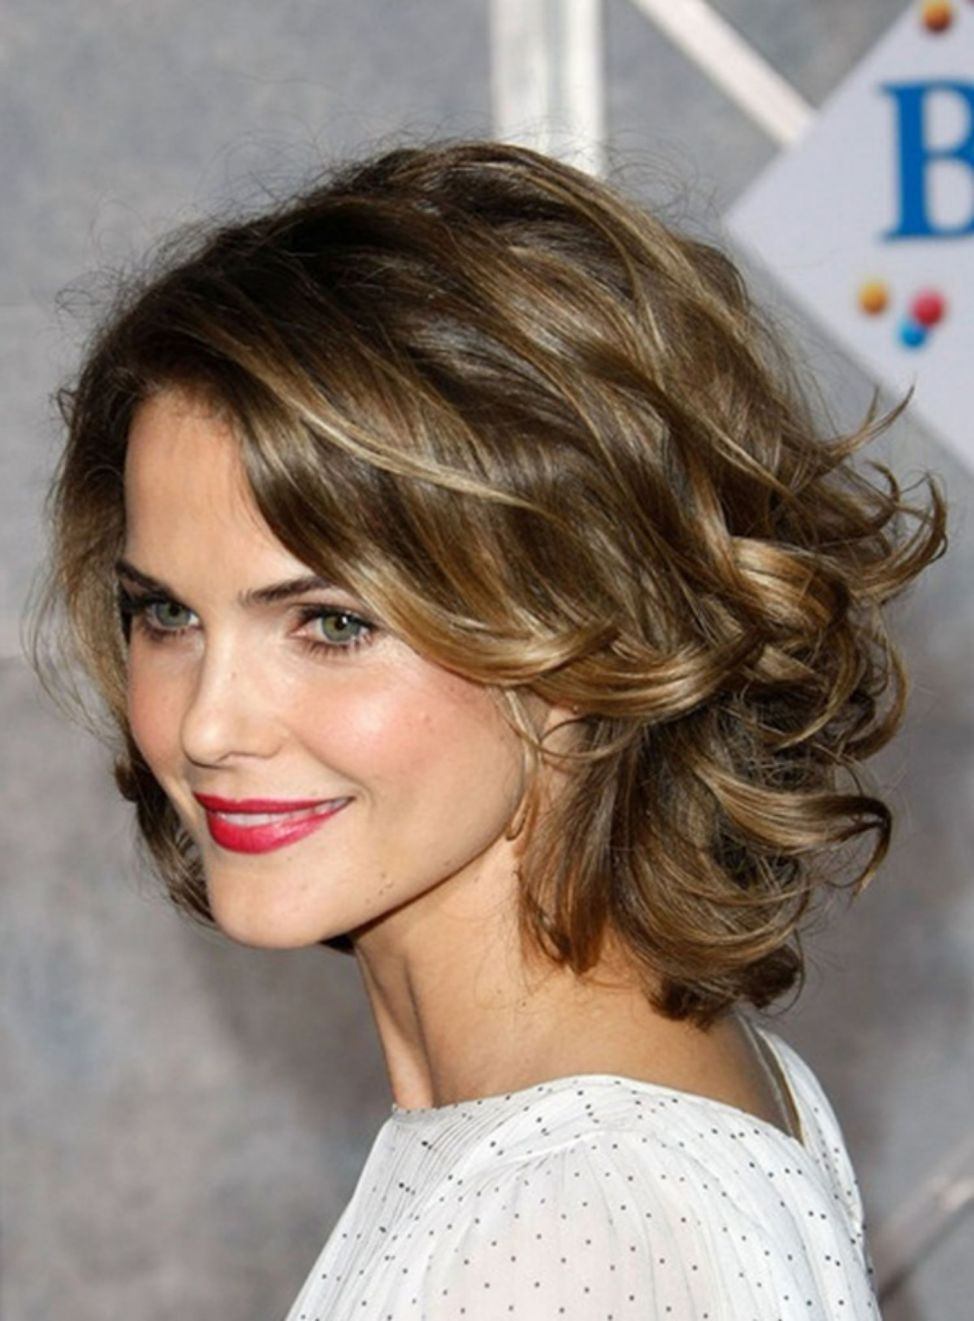 70 Perfect Medium Length Hairstyles For Thin Hair Medium Hair Styles Medium Length Hair Styles Medium Length Curly Hair